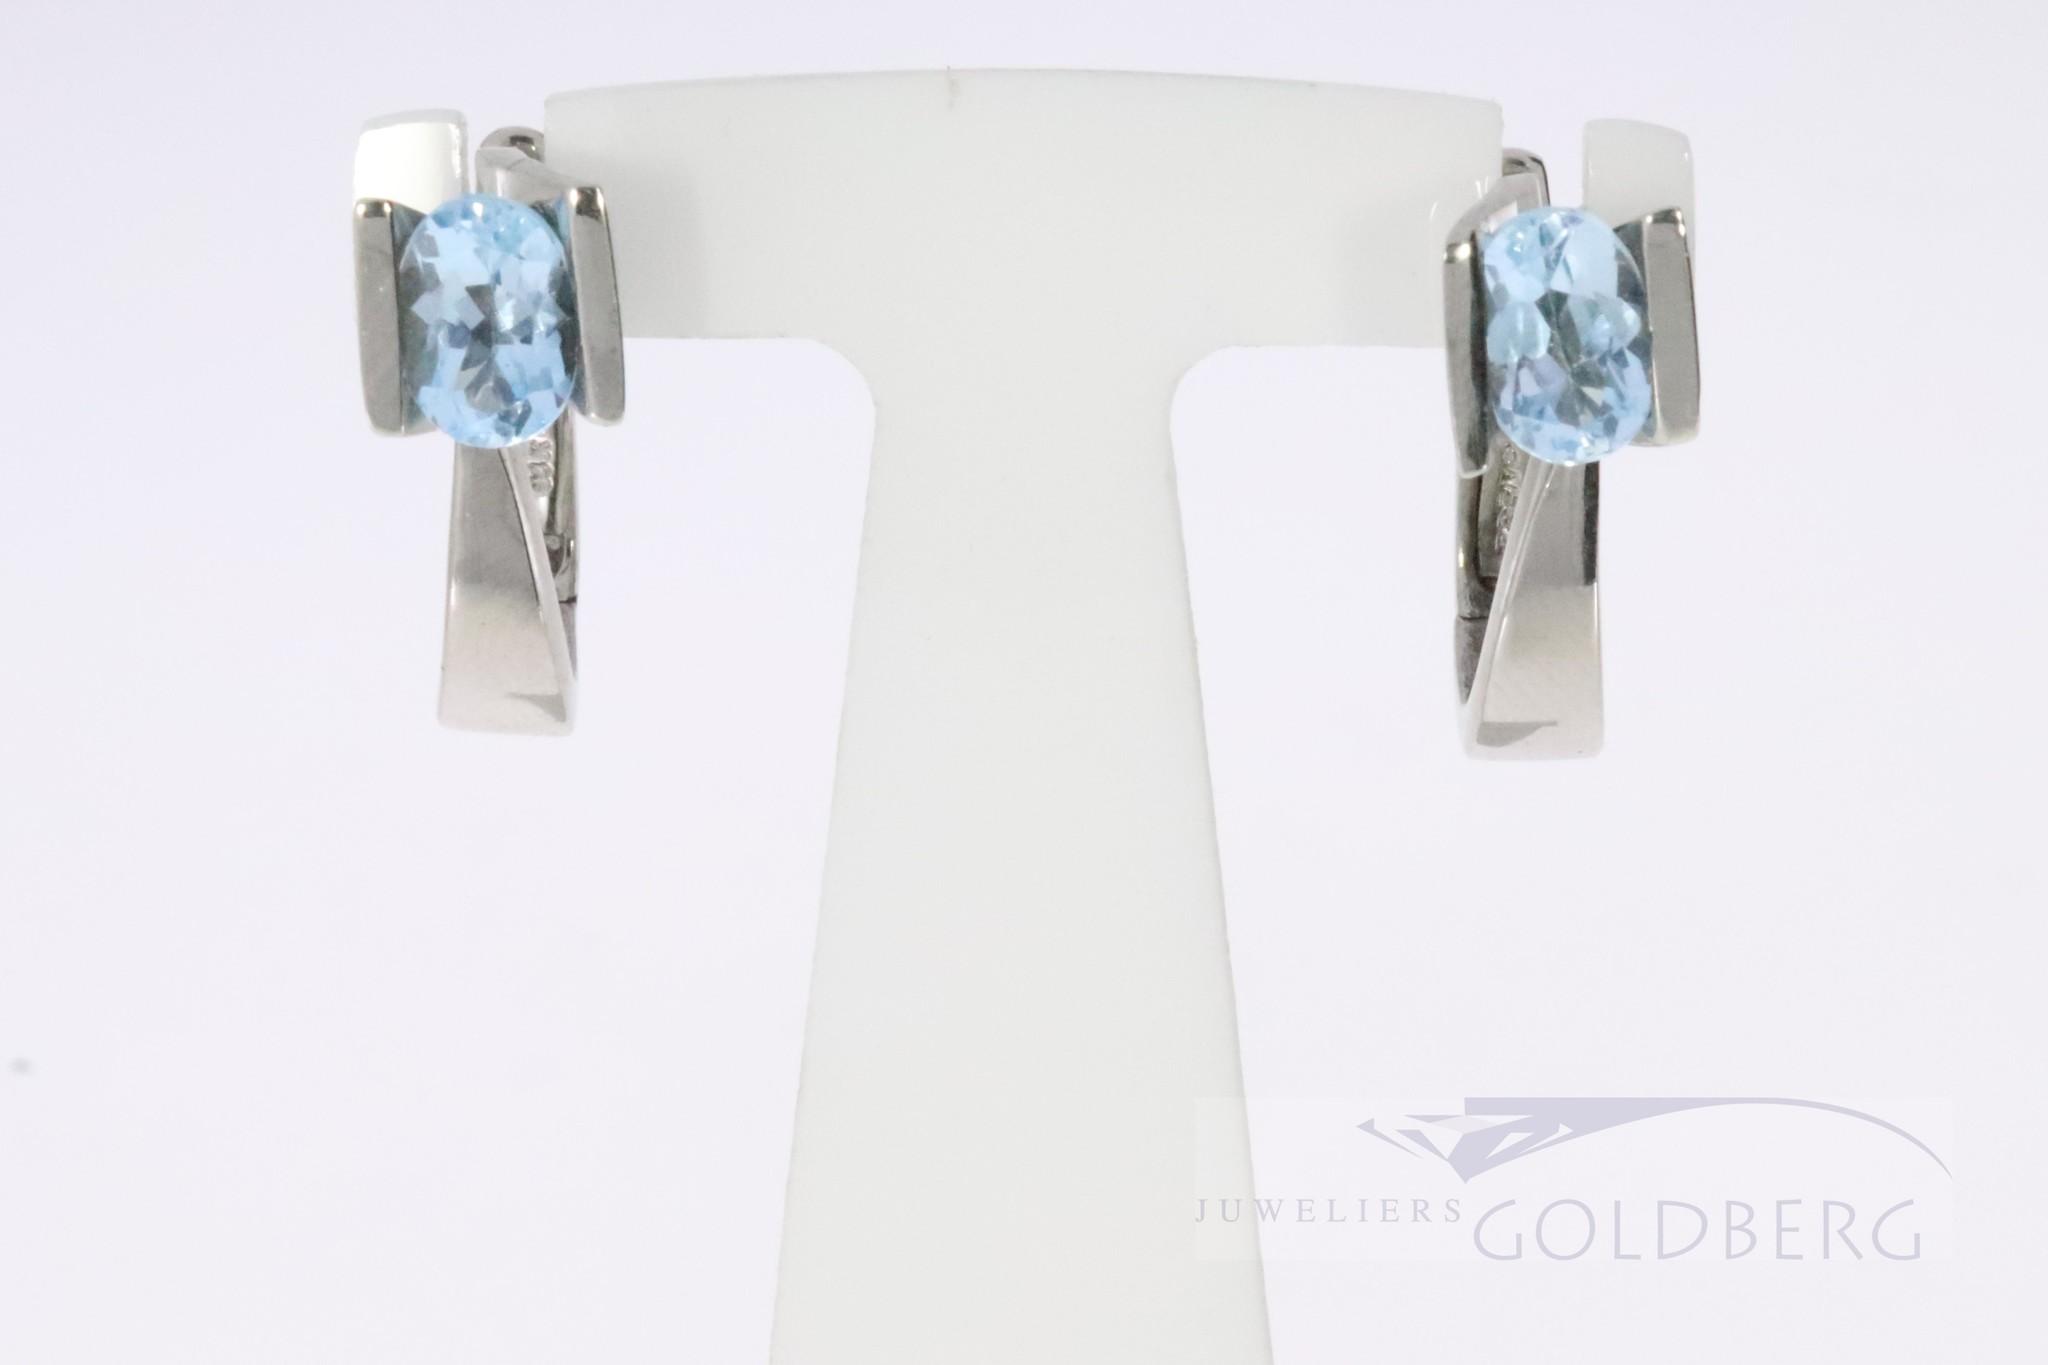 Moderne 14k witgouden oorbellen met blauwe topaas